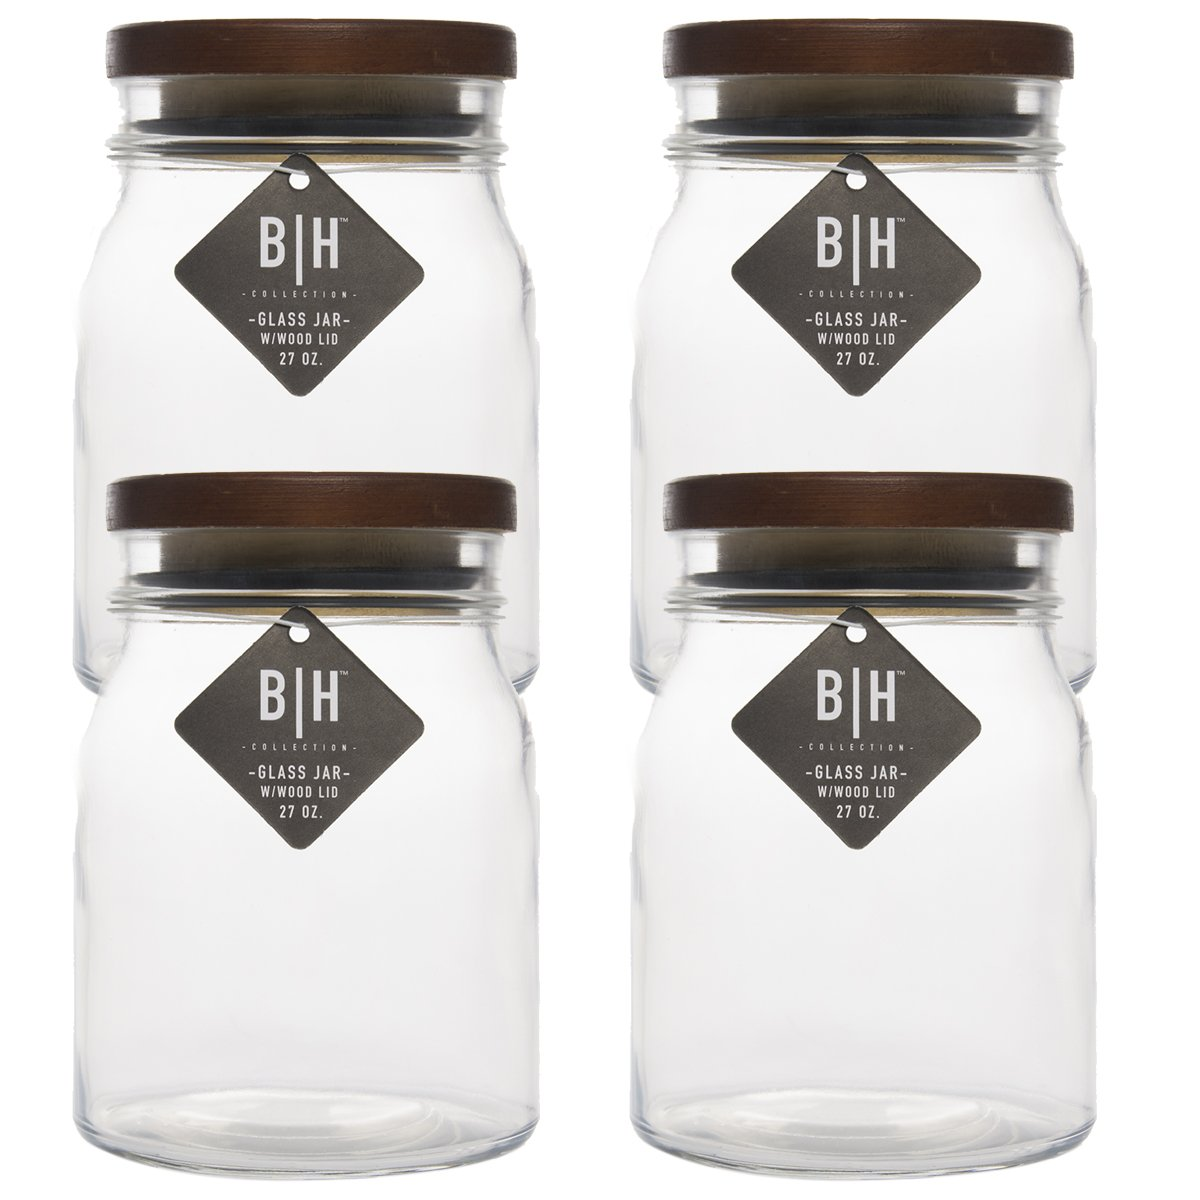 Blue Harbor (4 Pack) 27oz Clear Glass Storage Jars With Wood Lids Decorative Kitchen or Craft Jar Set